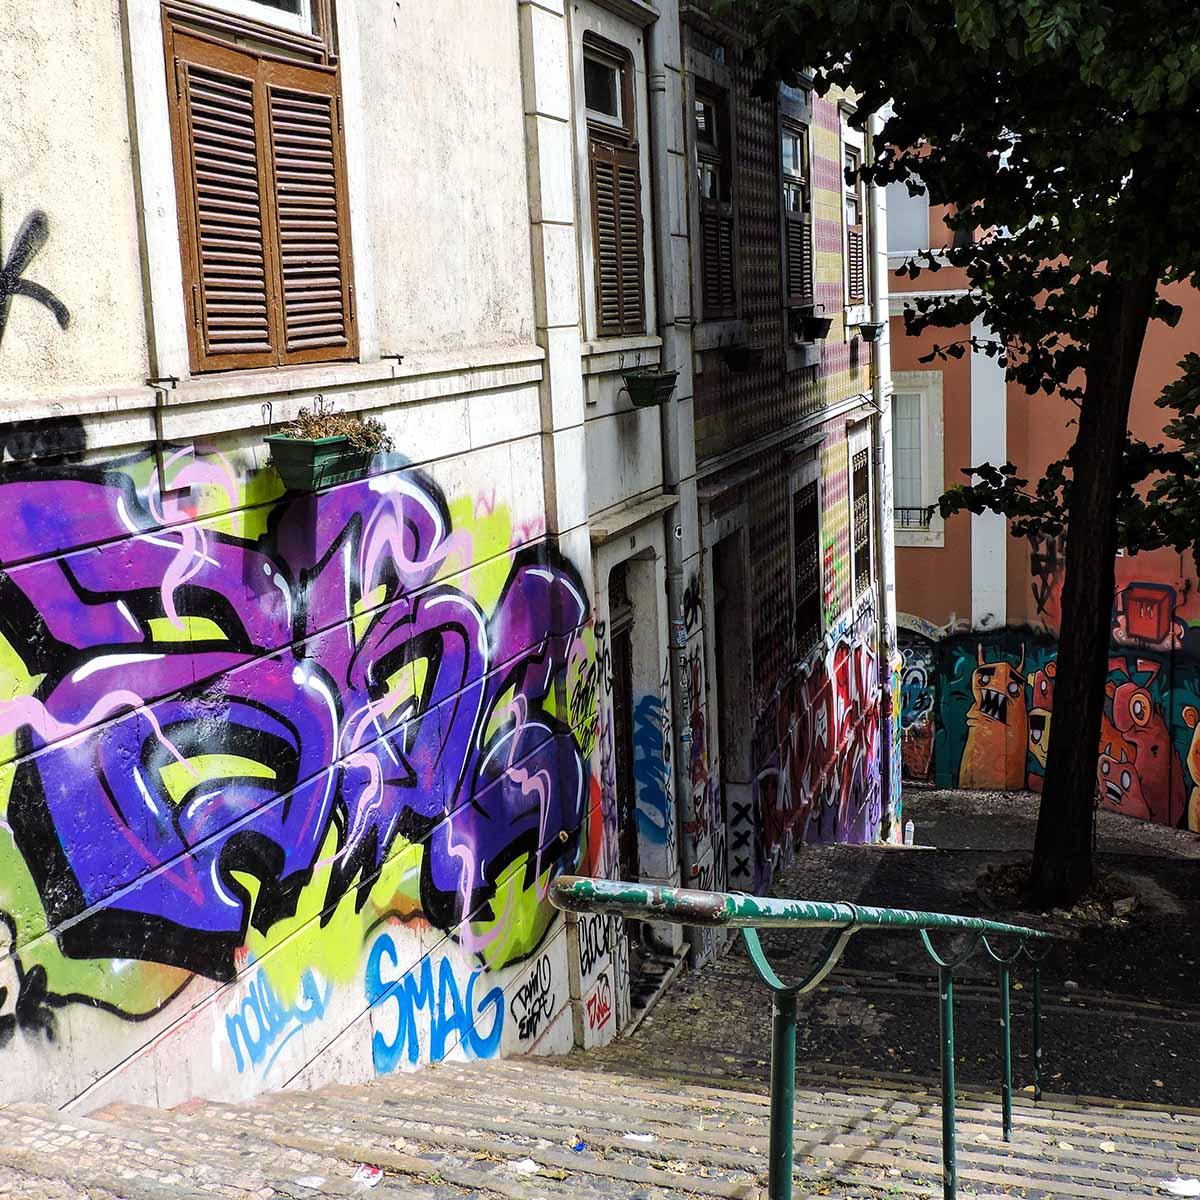 Bairro Alto graffiti'ed stairwell